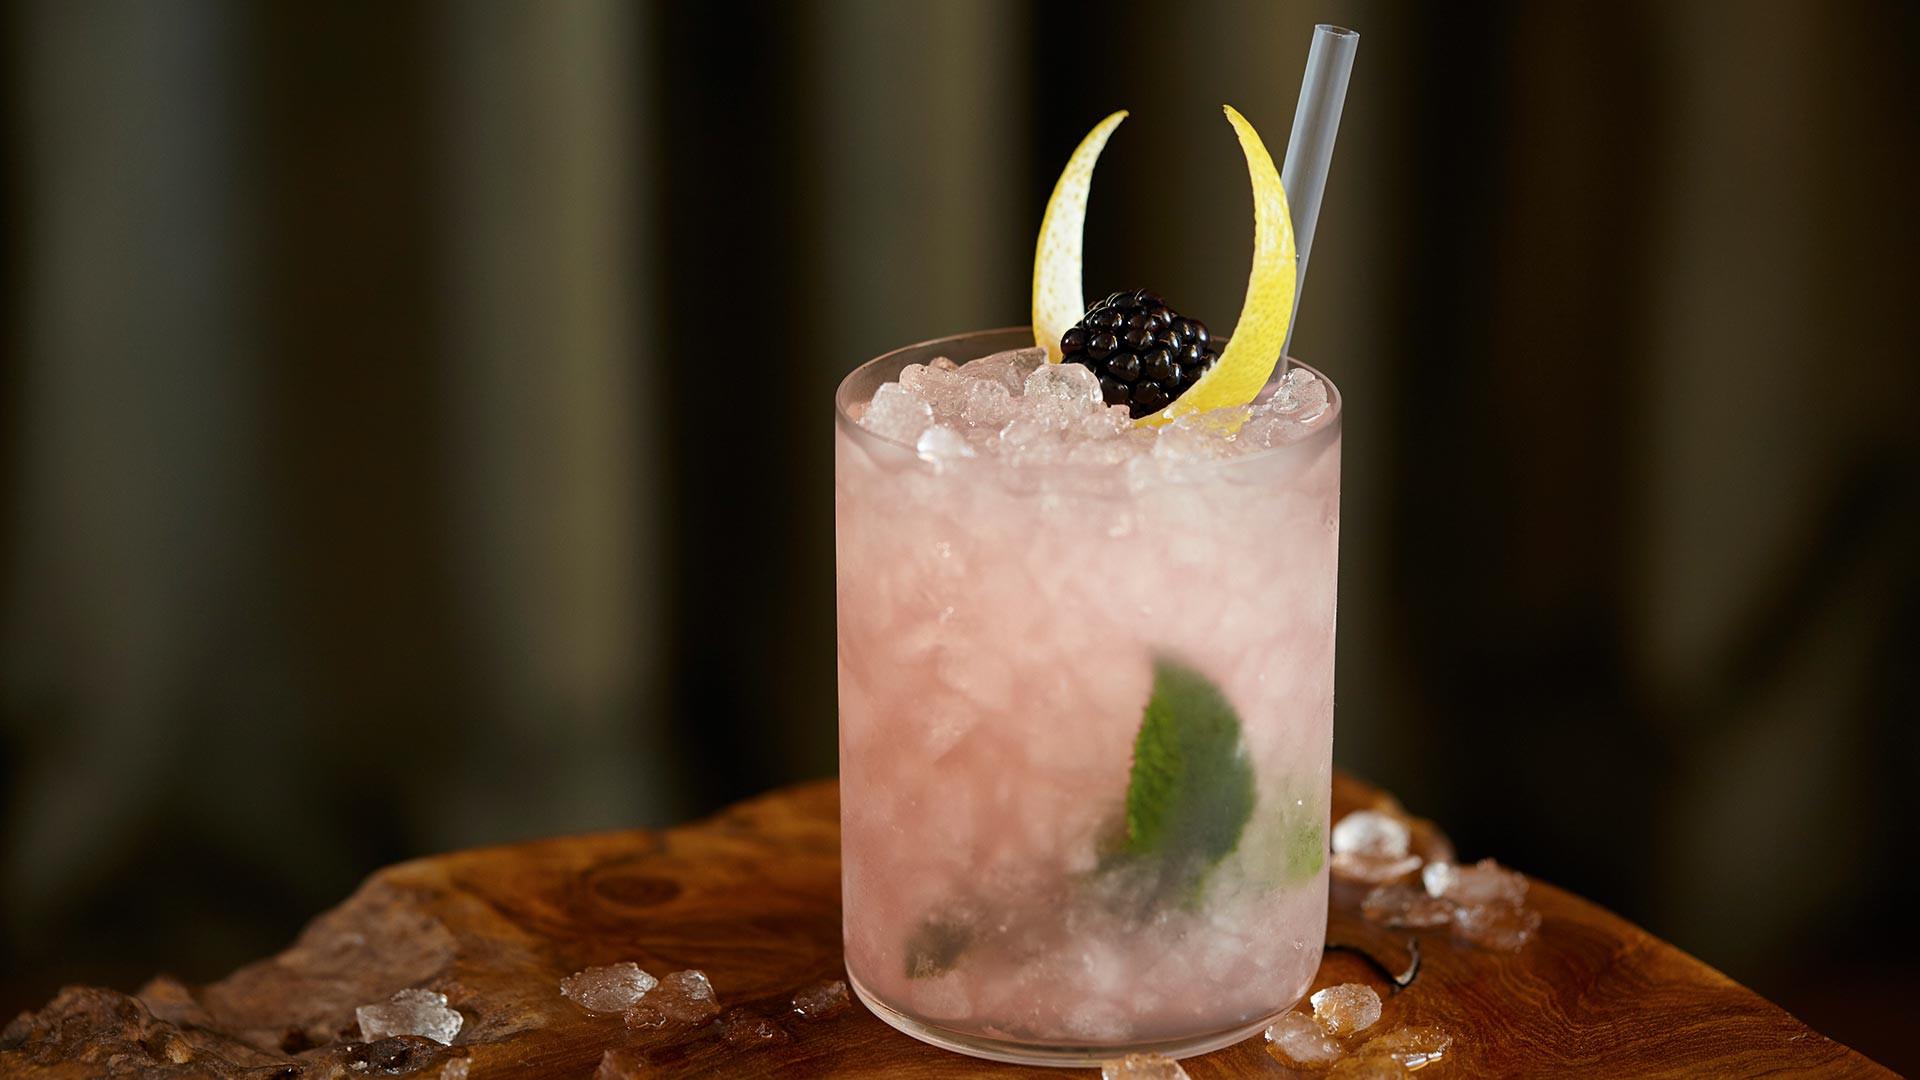 The Catkin cocktail at Dandelyan